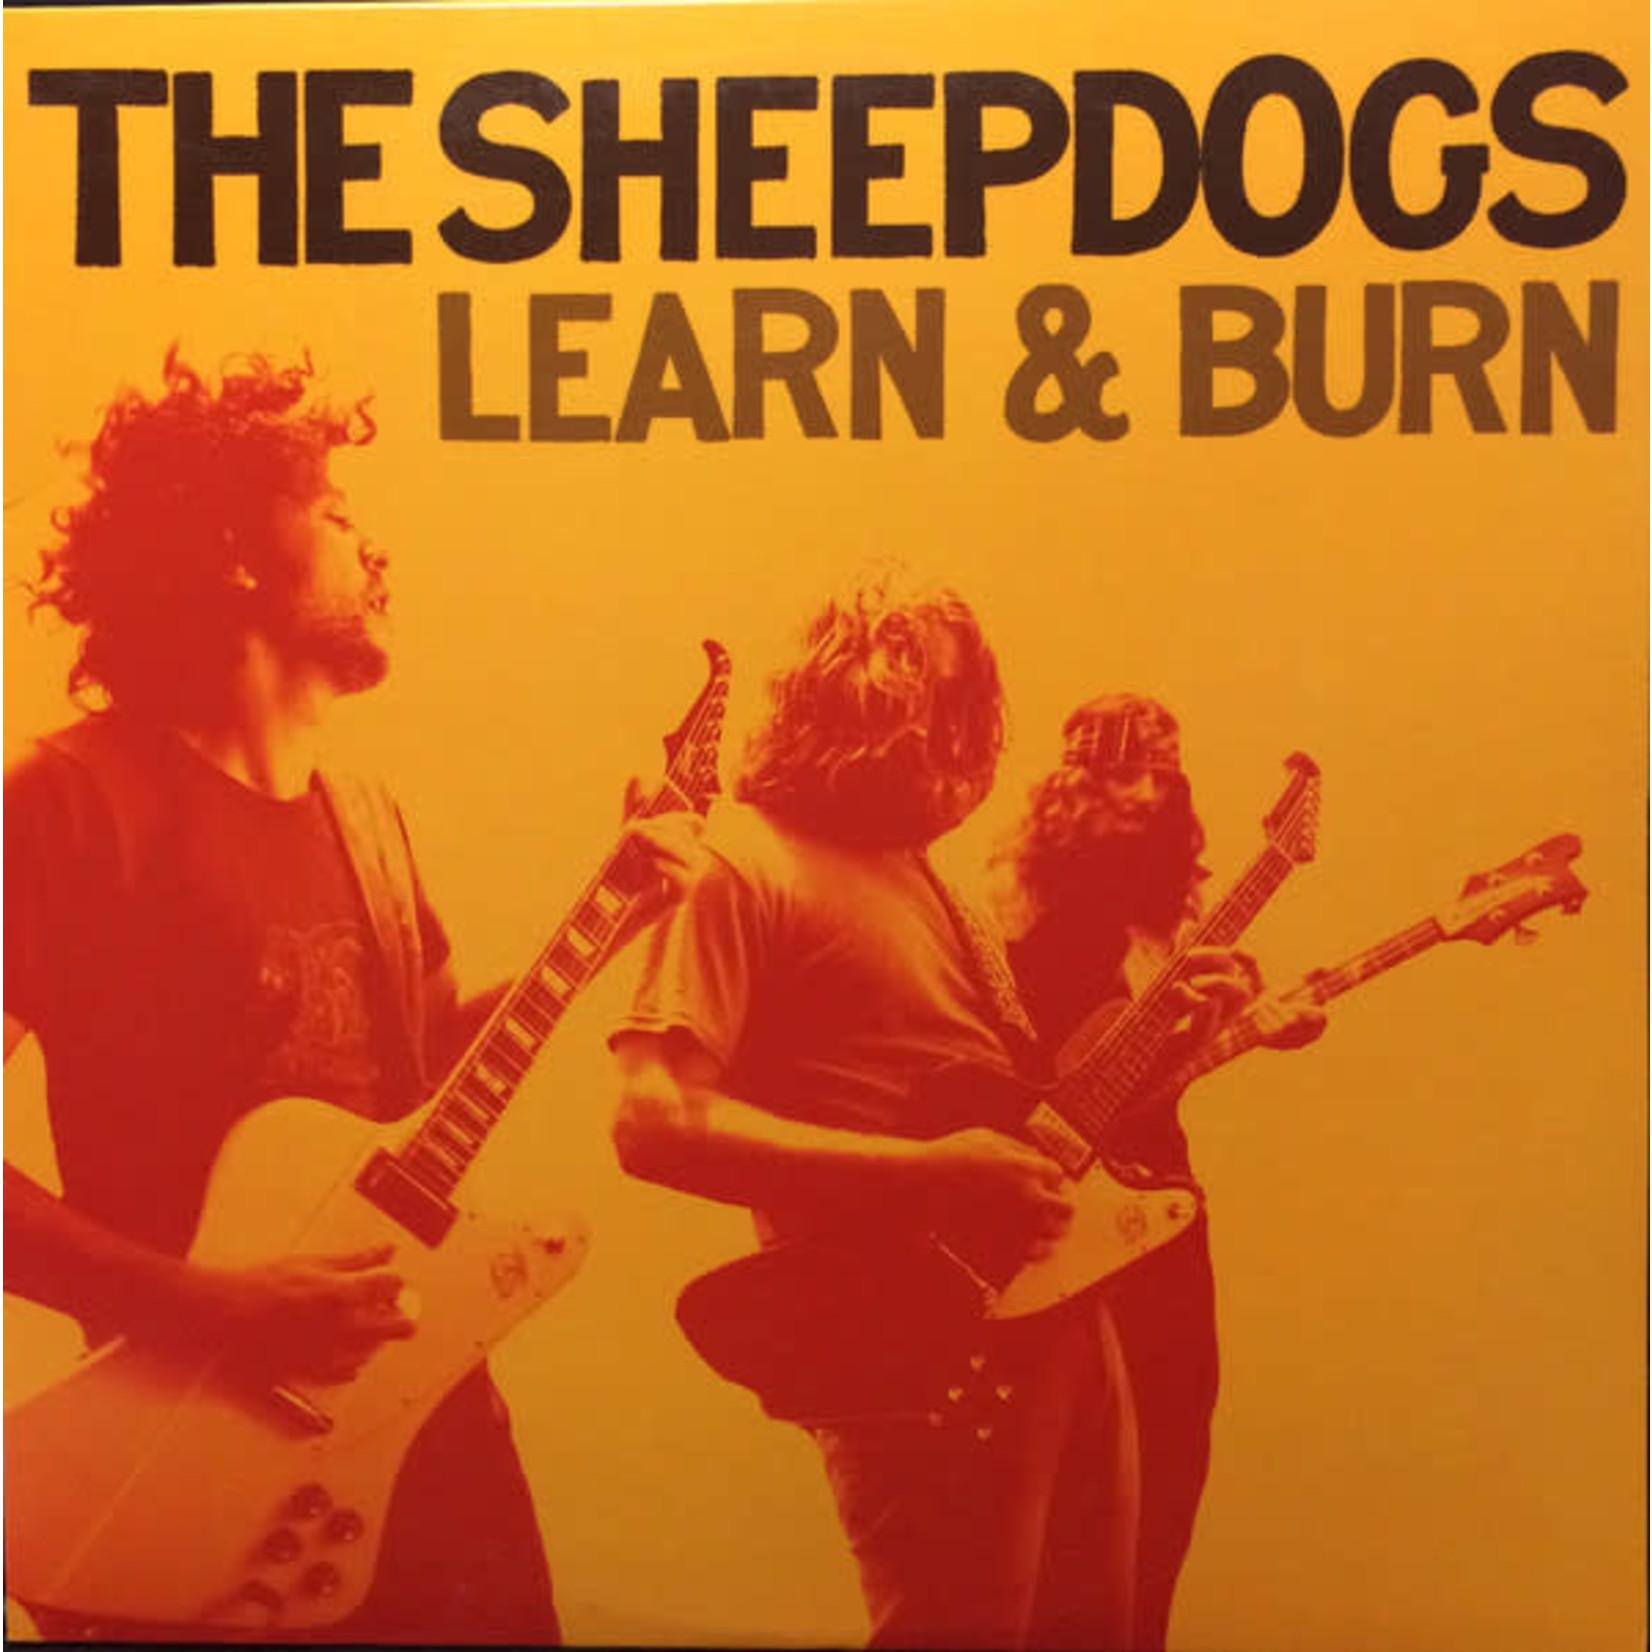 THE SHEEPDOGS LEARN & BURN